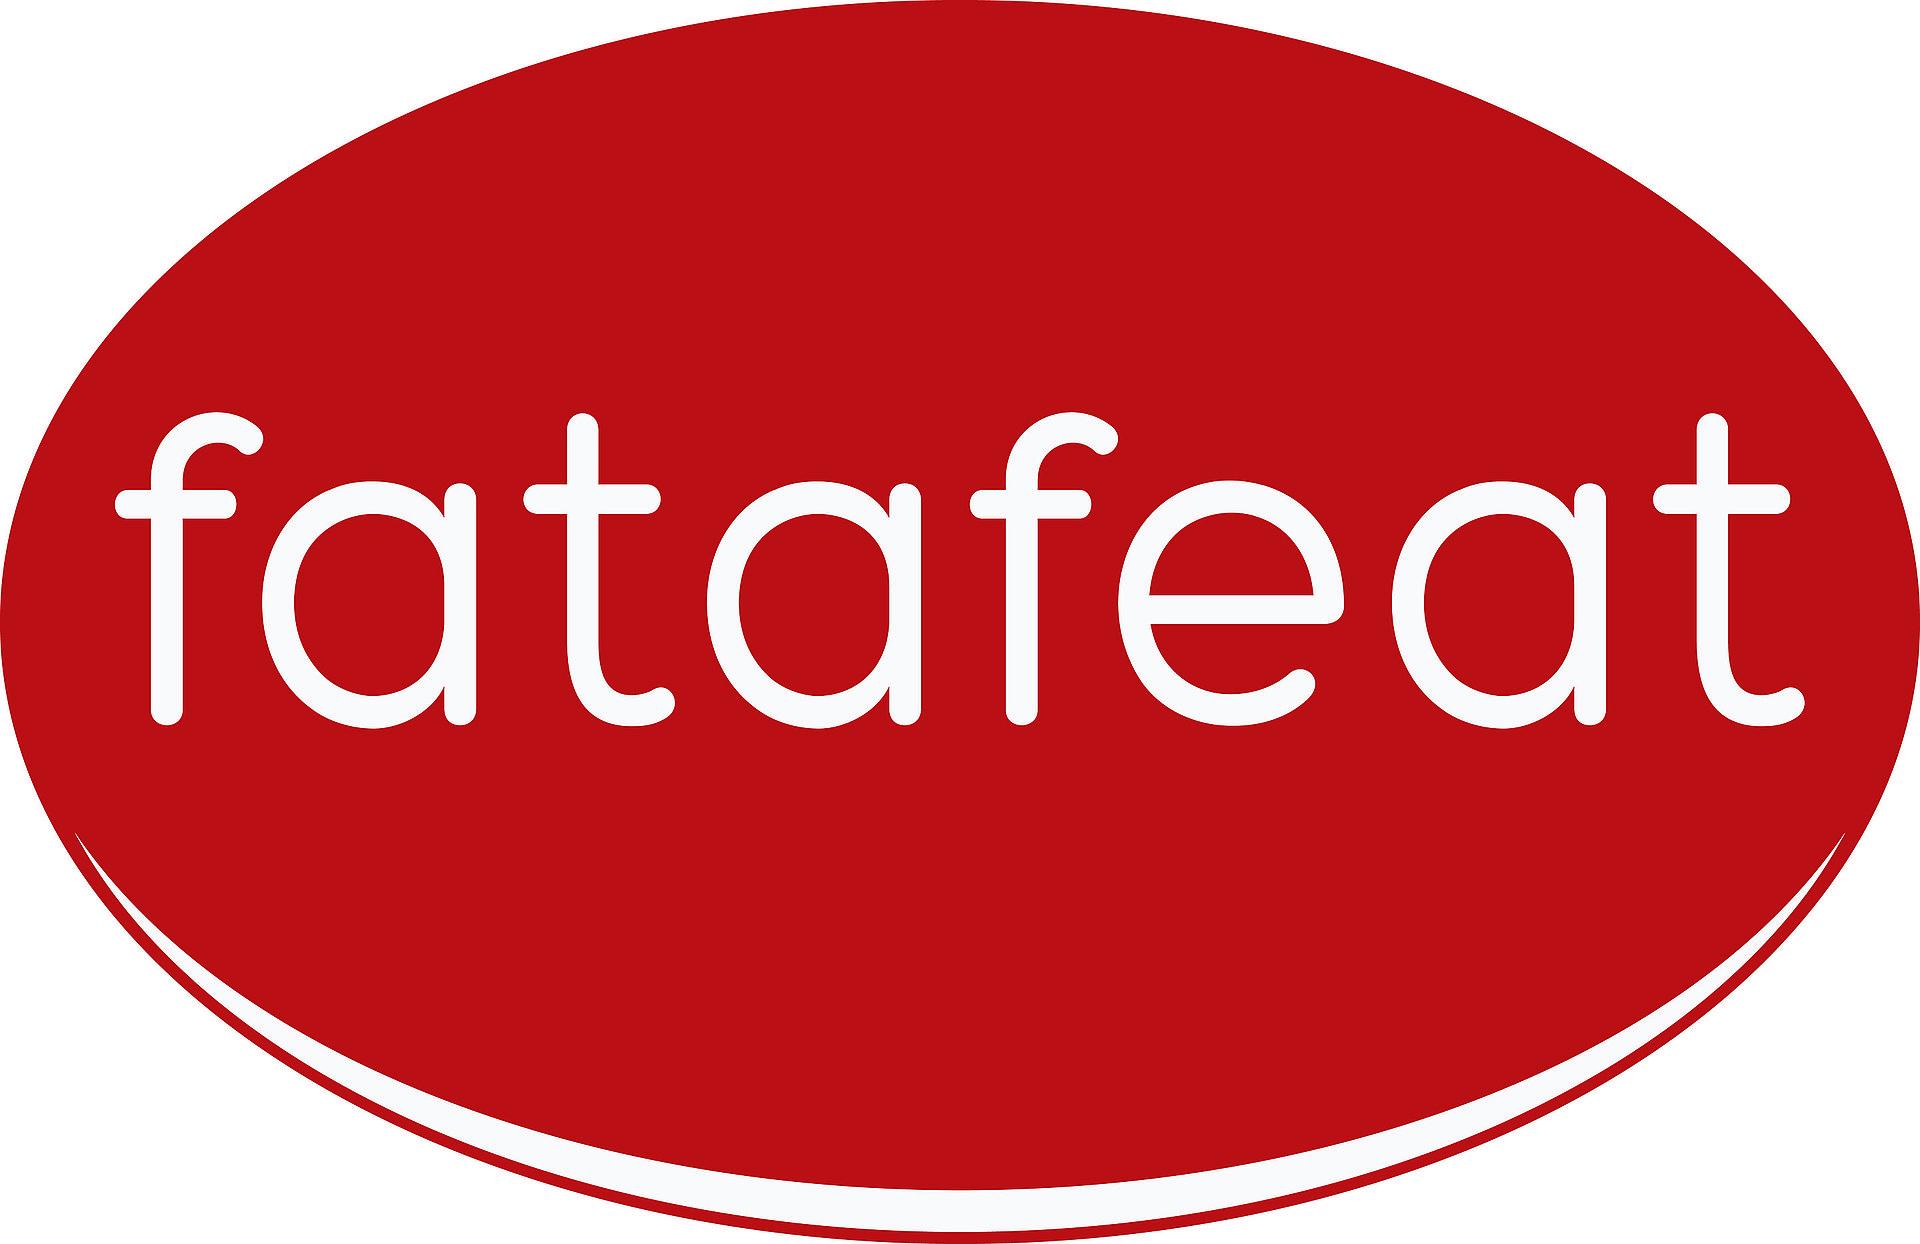 C Language Logo Fatafeat - Wikipedia